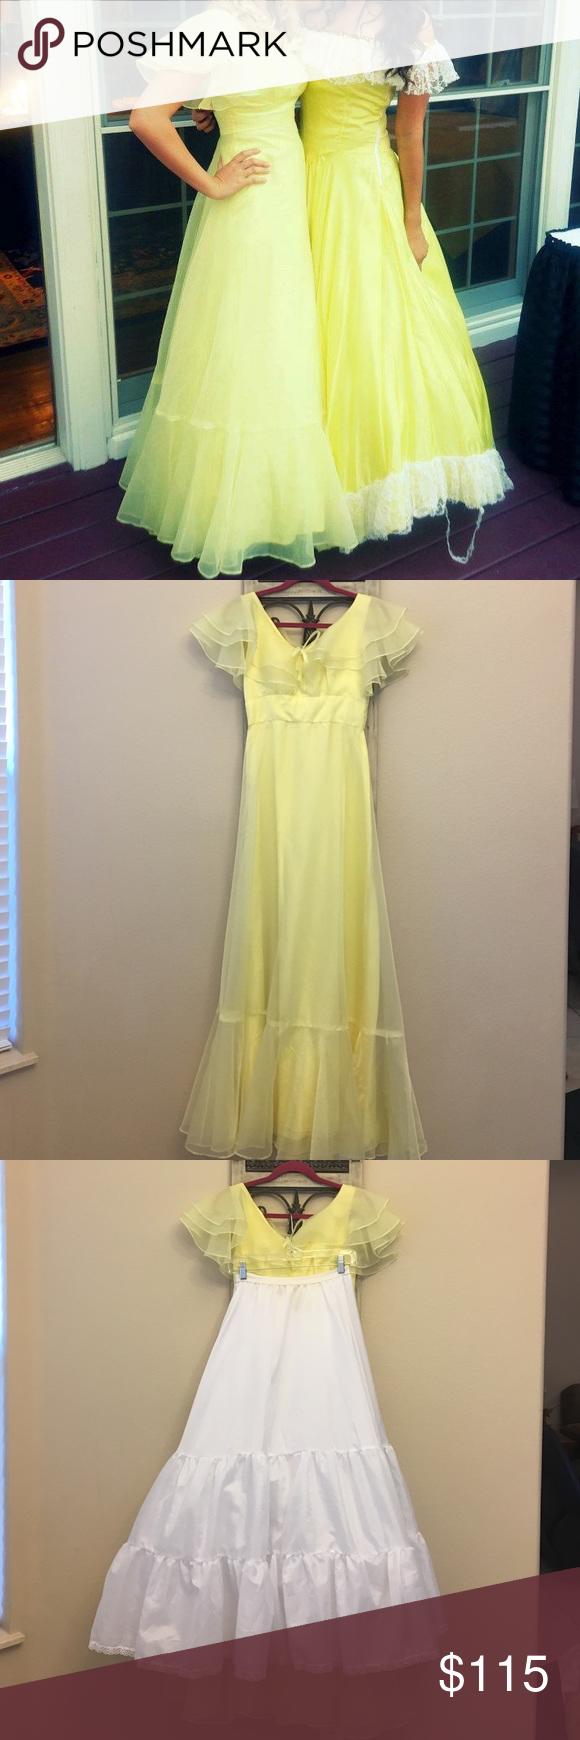 Yellow dress like belle  Yellow southern belle dress with crinoline skirt  Crinoline skirt